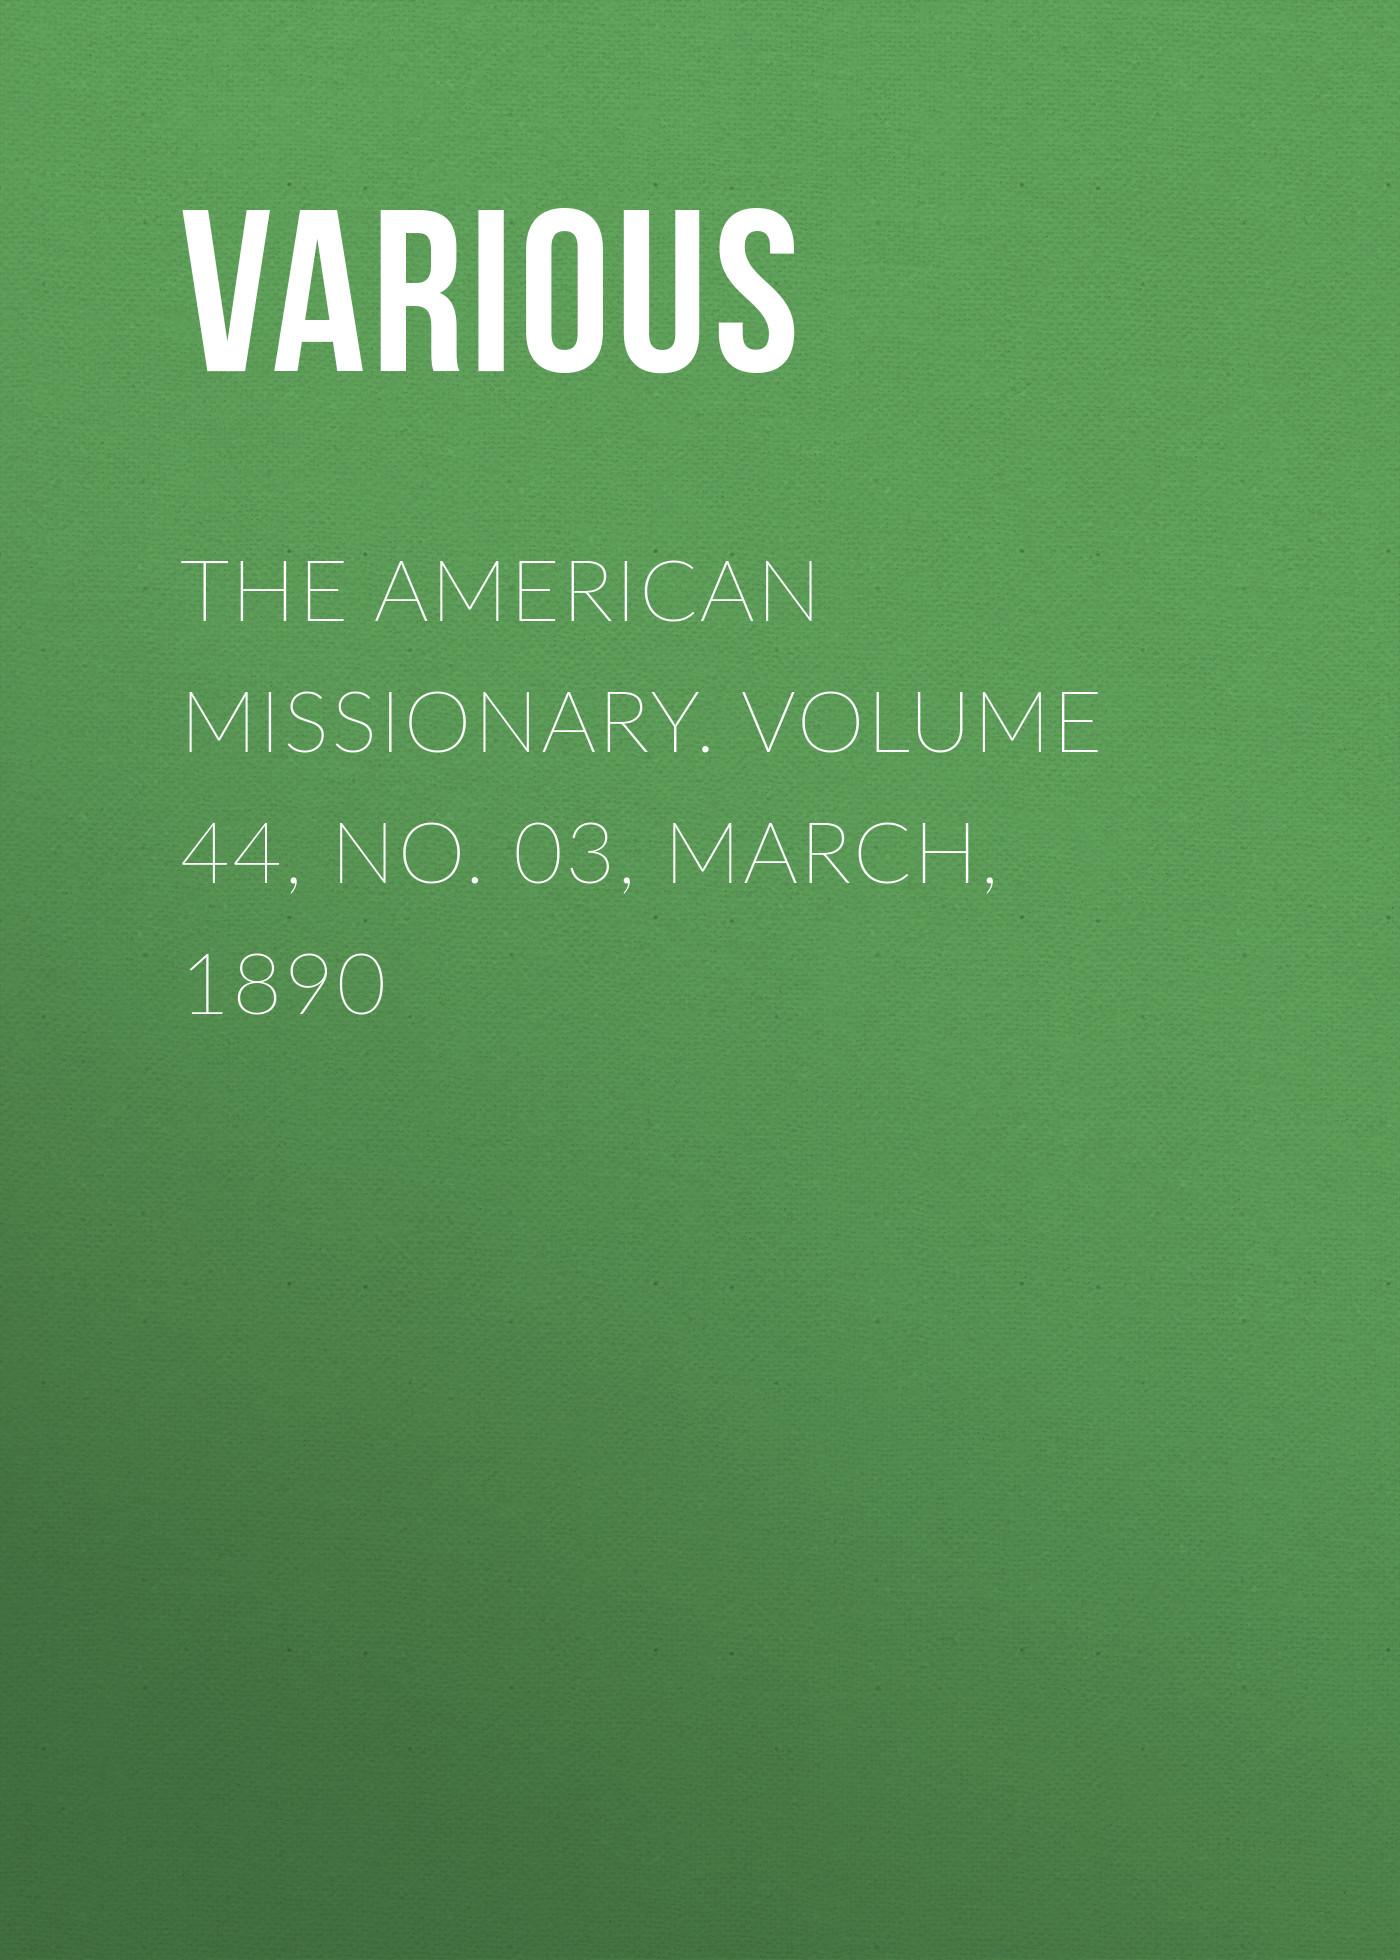 лучшая цена Various The American Missionary. Volume 44, No. 03, March, 1890